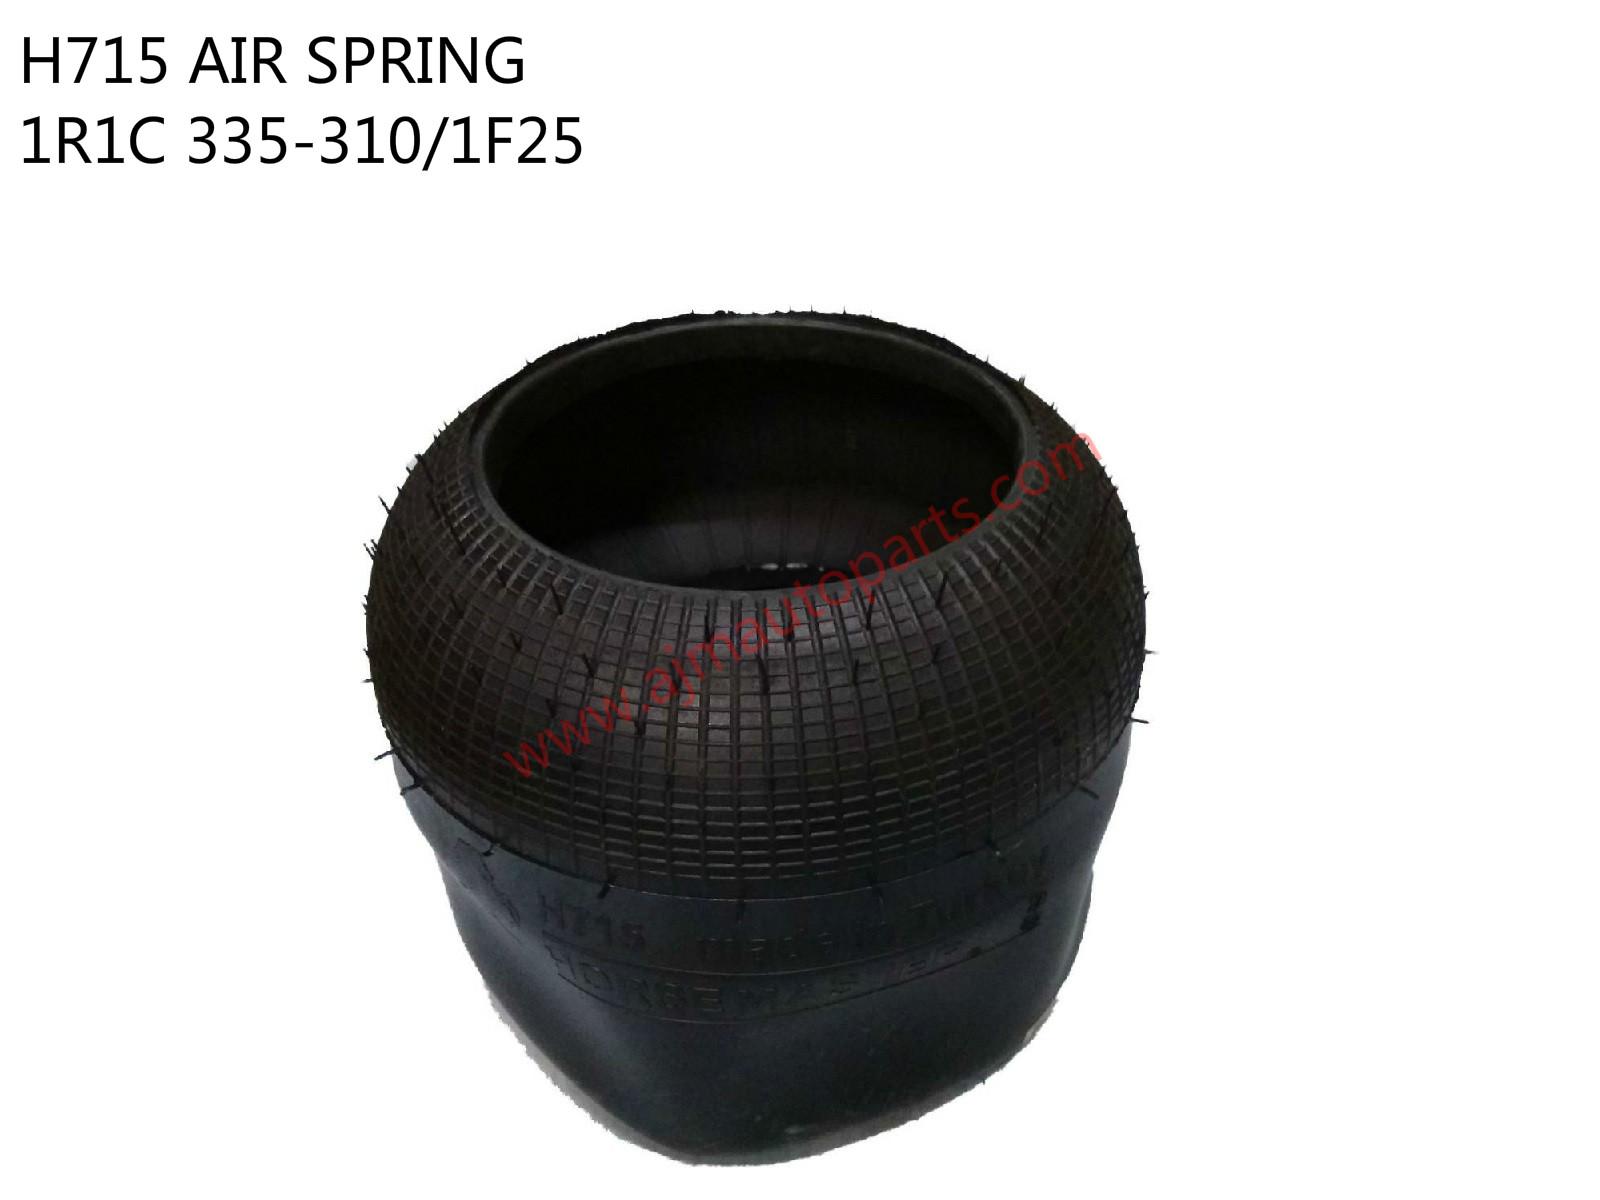 H715 AIR SPRING-1R1C-335-310